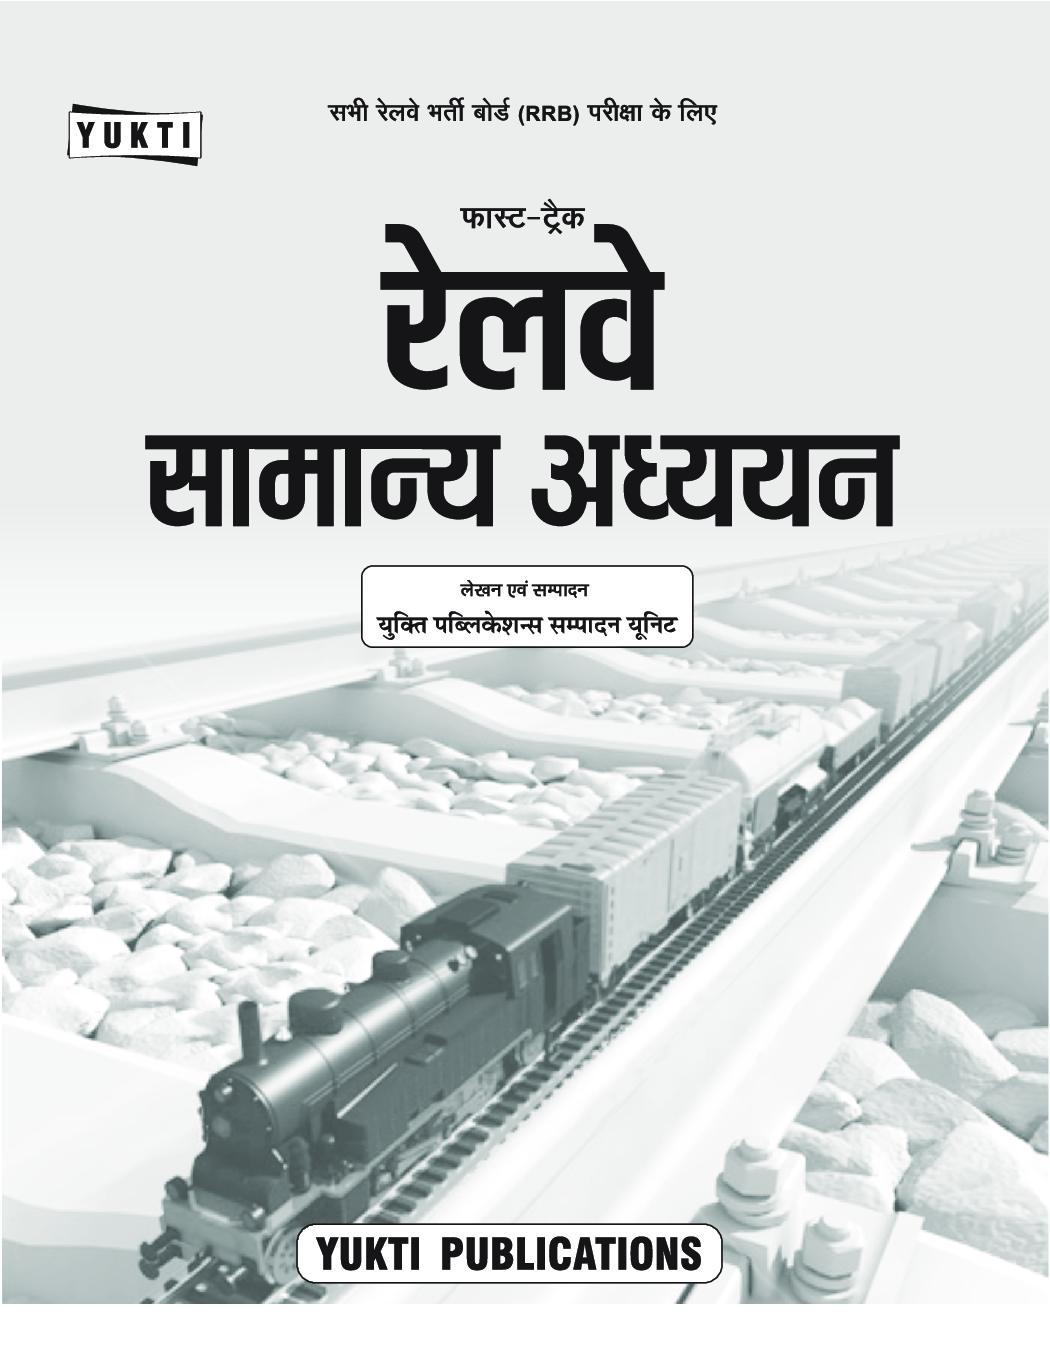 रेलवे सामान्य अध्ययन - Page 2